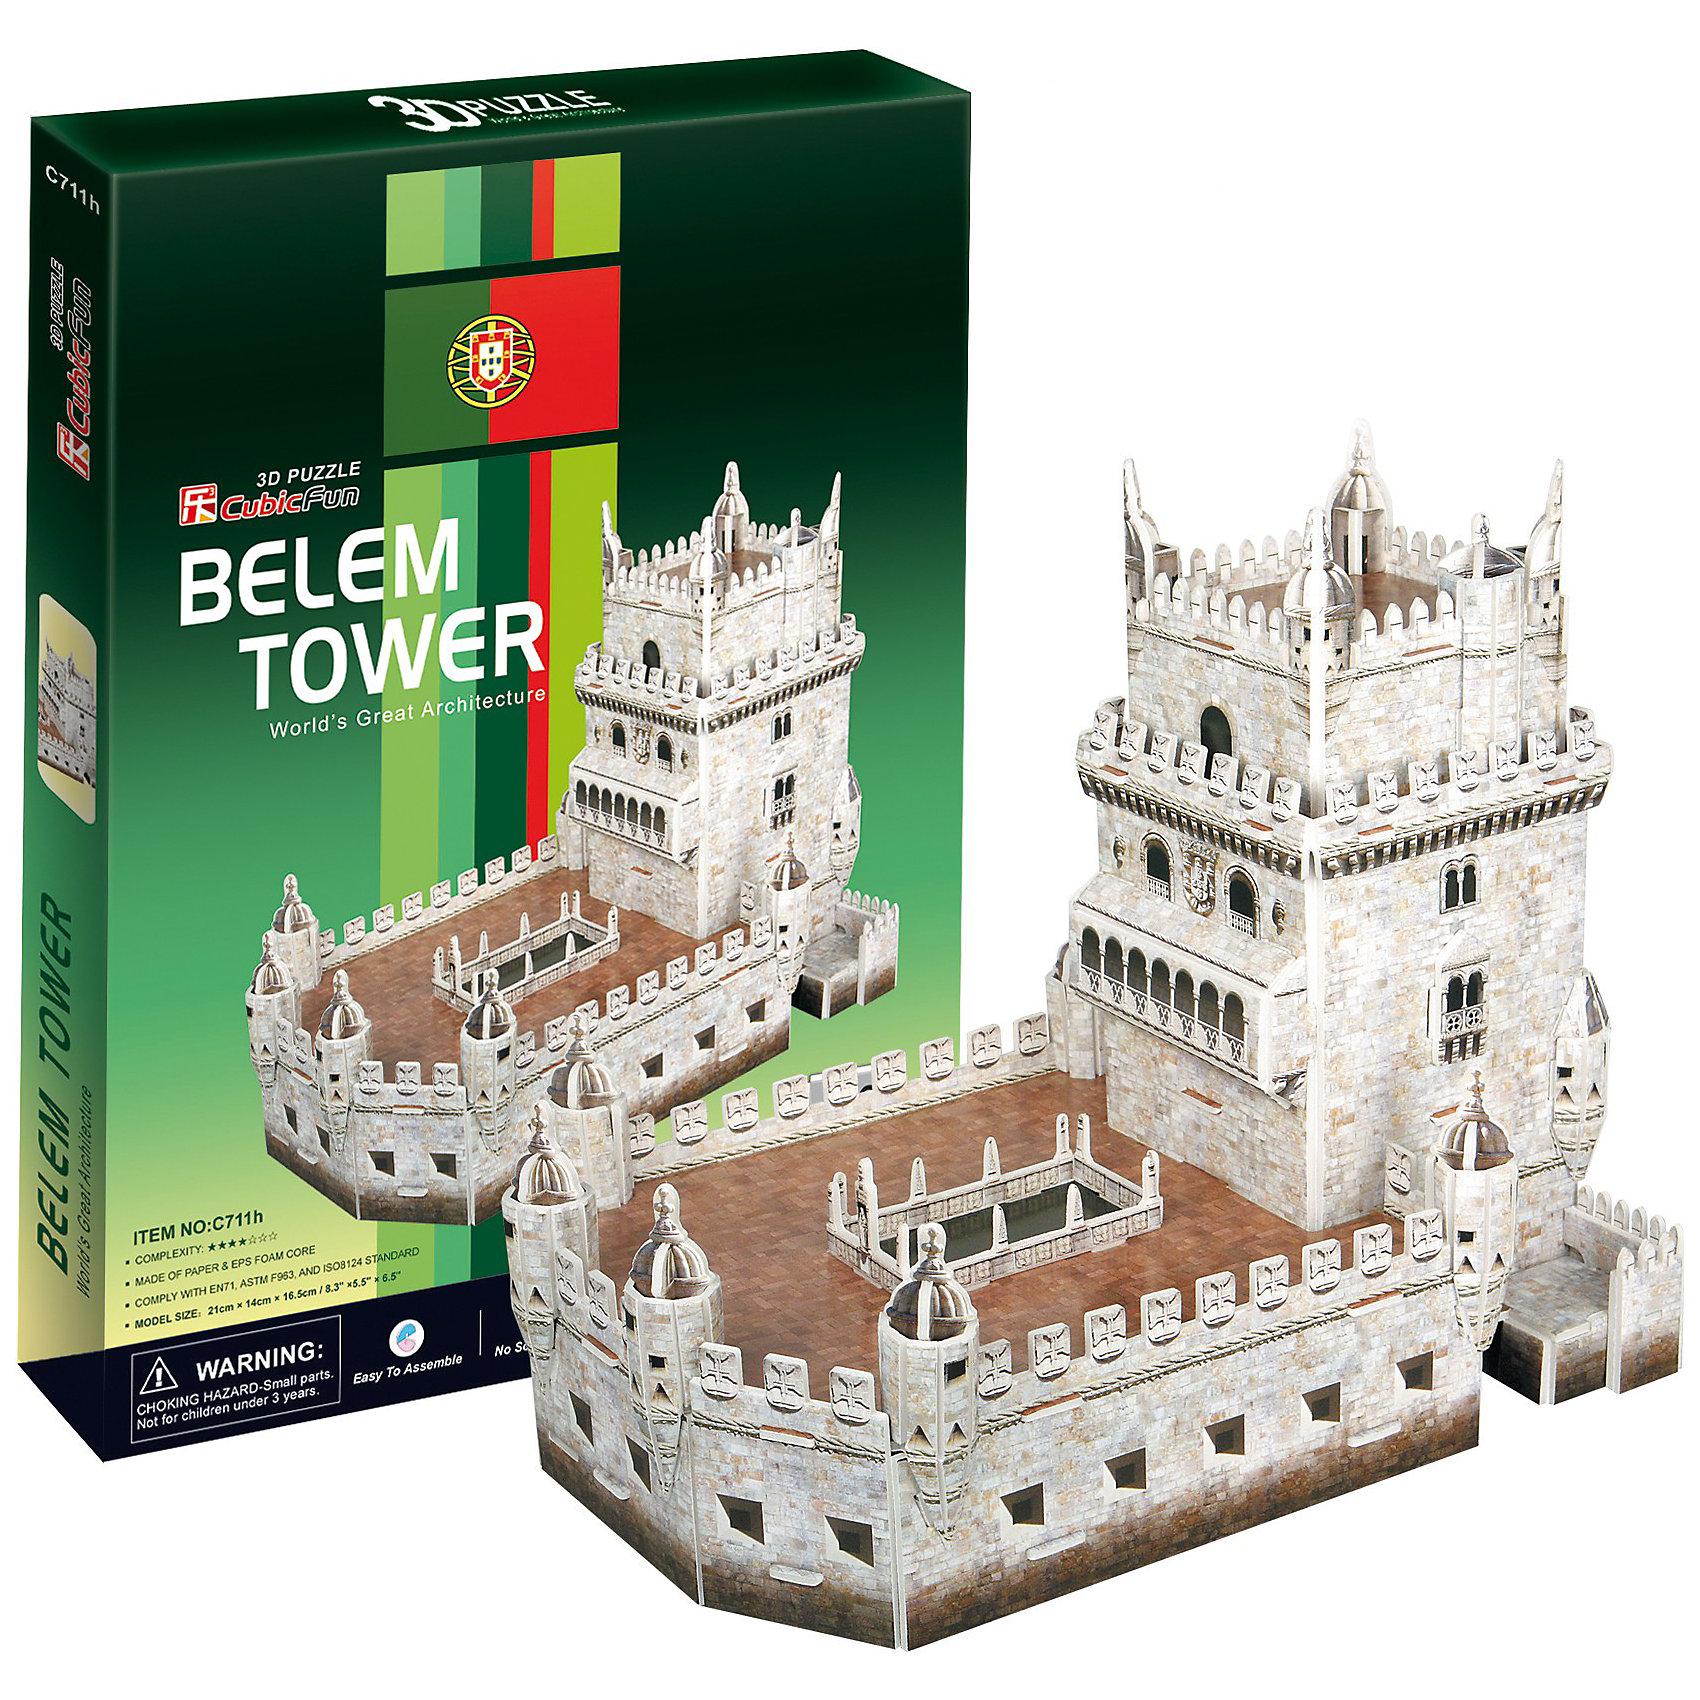 CubicFun Пазл 3D Башня Белен (Португалия), 46 деталей, CubicFun cubicfun 3d пазл эйфелева башня 2 франция cubicfun 33 детали